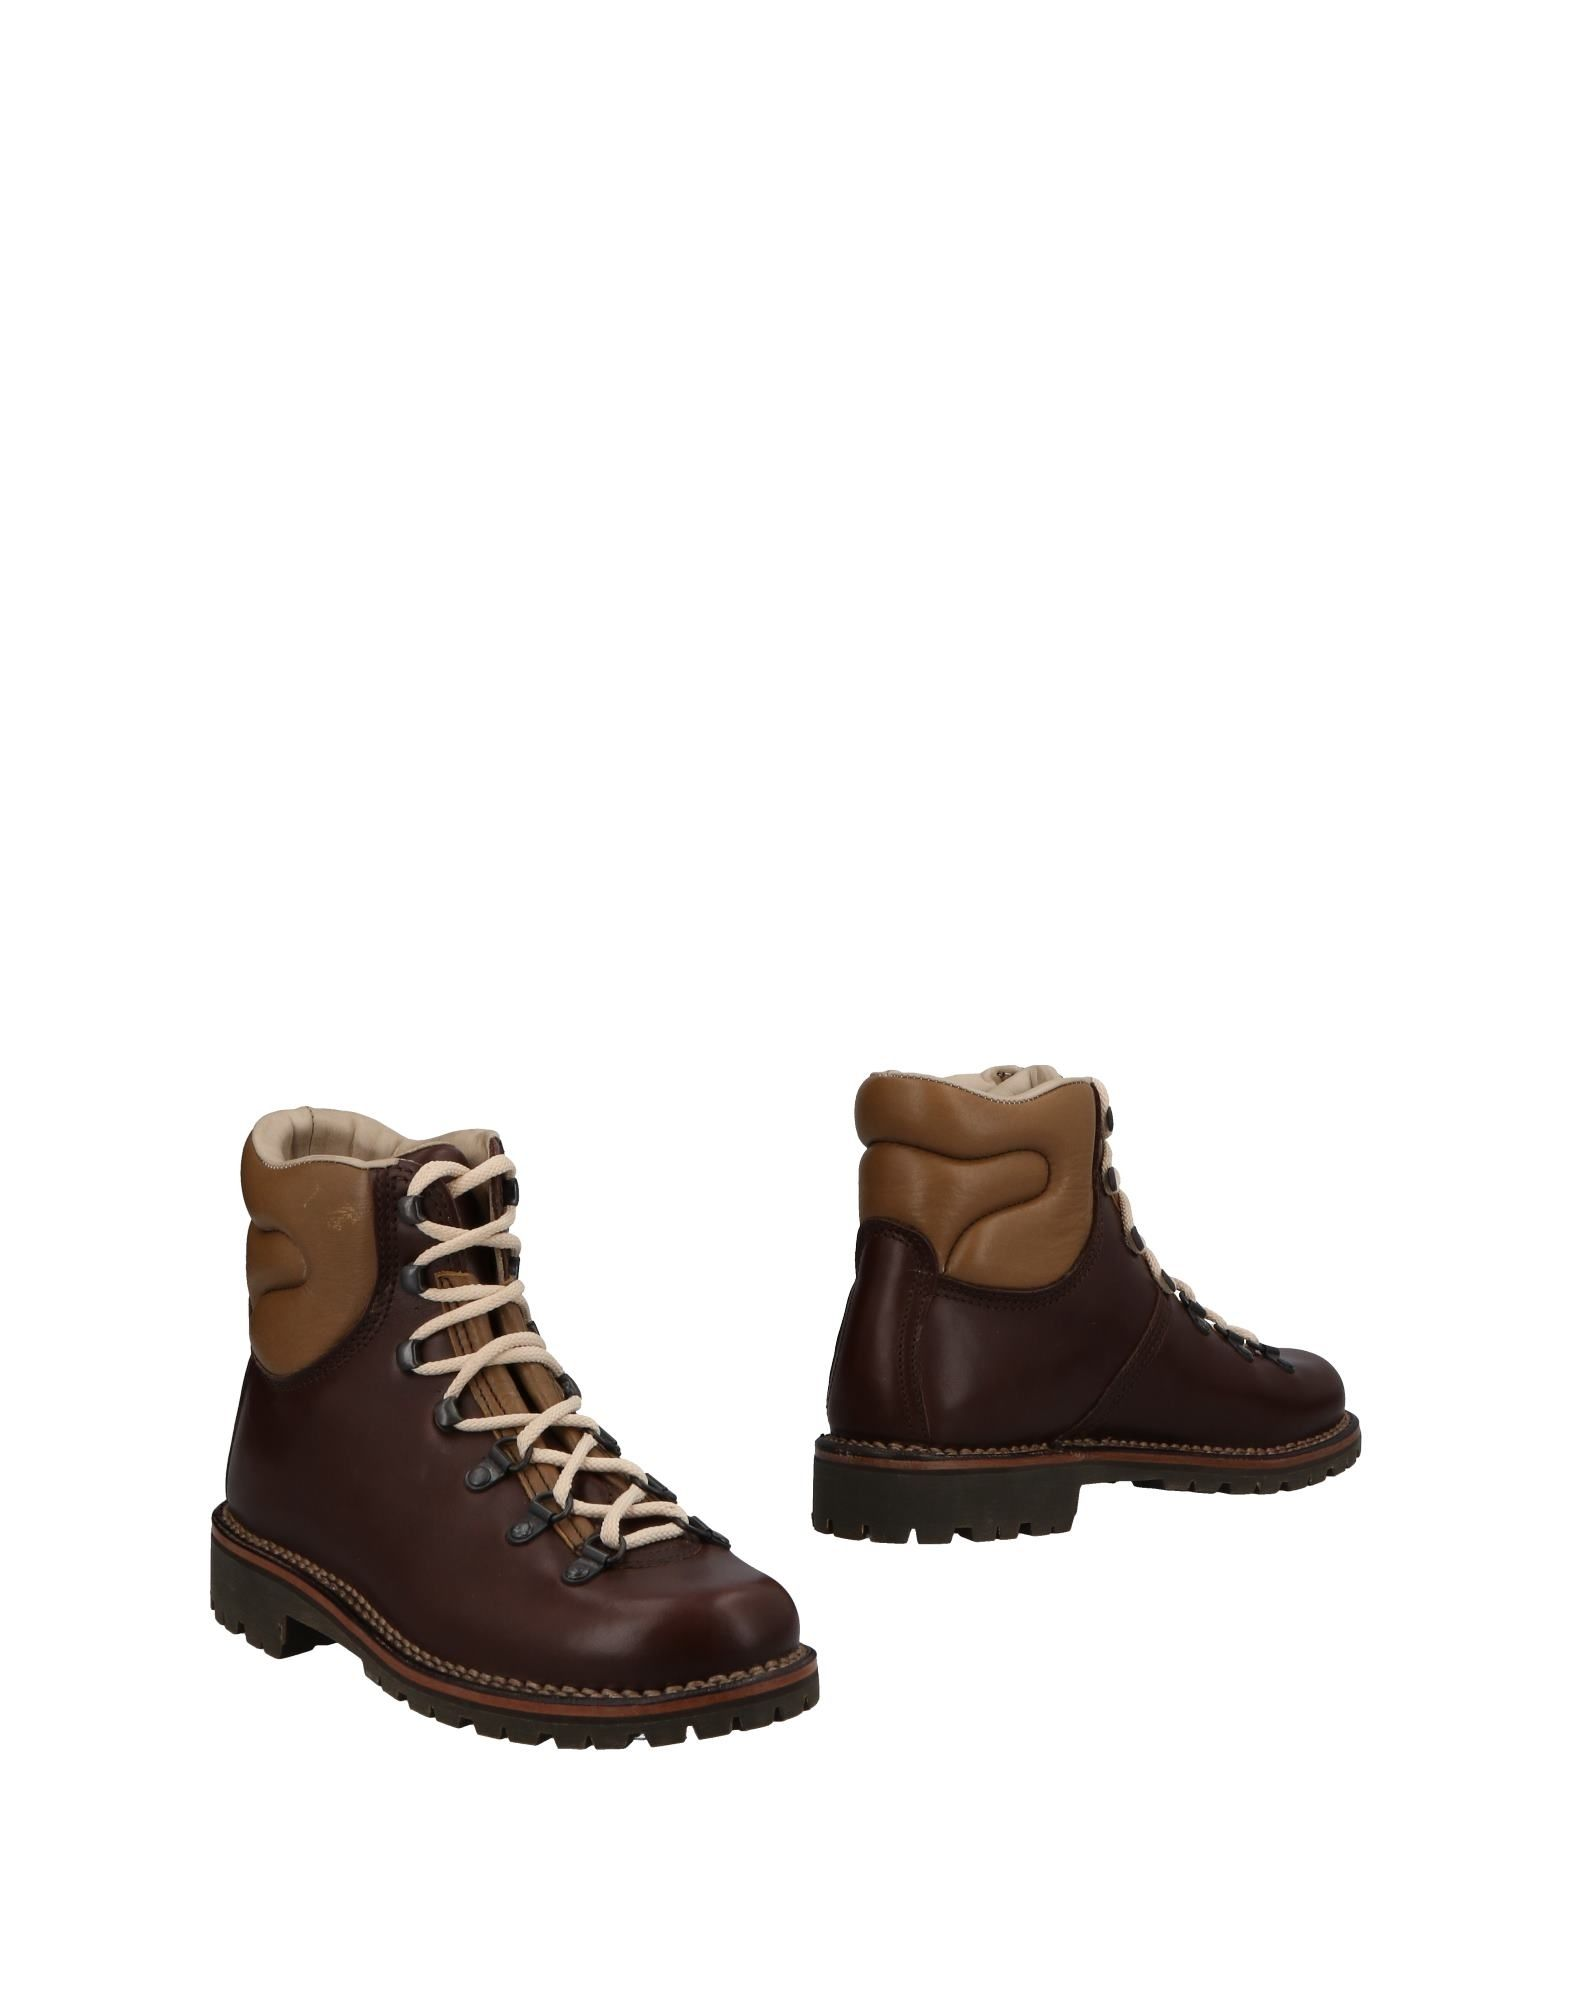 Rabatt Schuhe Wanderlust Stiefelette Damen  11498644LW